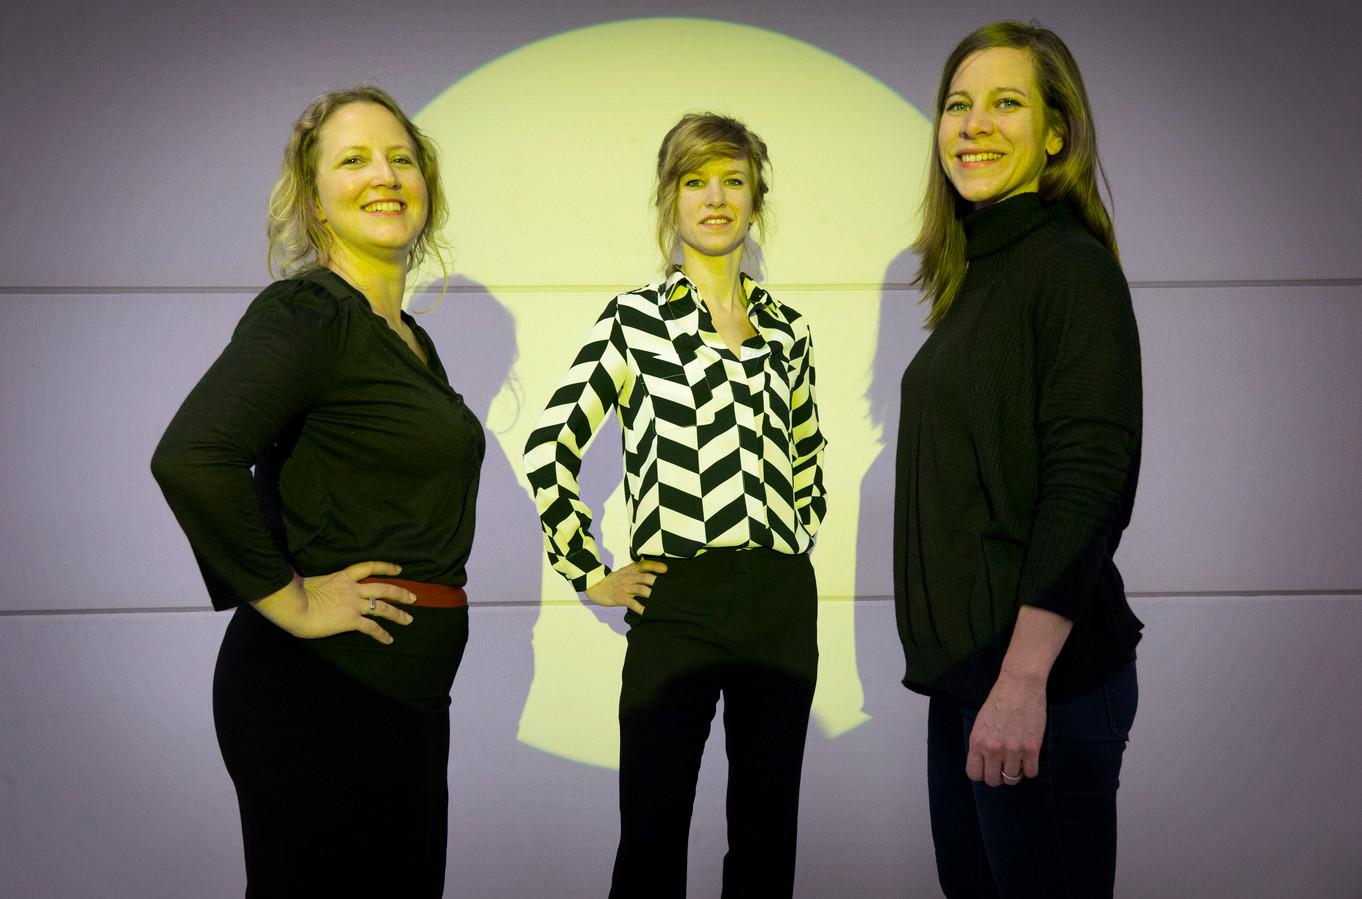 Debbie van Berkel, Jojanneke Postma en Cathalijne Postma van Kunstenaarscollectief Kasboek gaan op zoek naar Roosendaalse helden. Foto: Joyce van Belkom/Pix4Profs